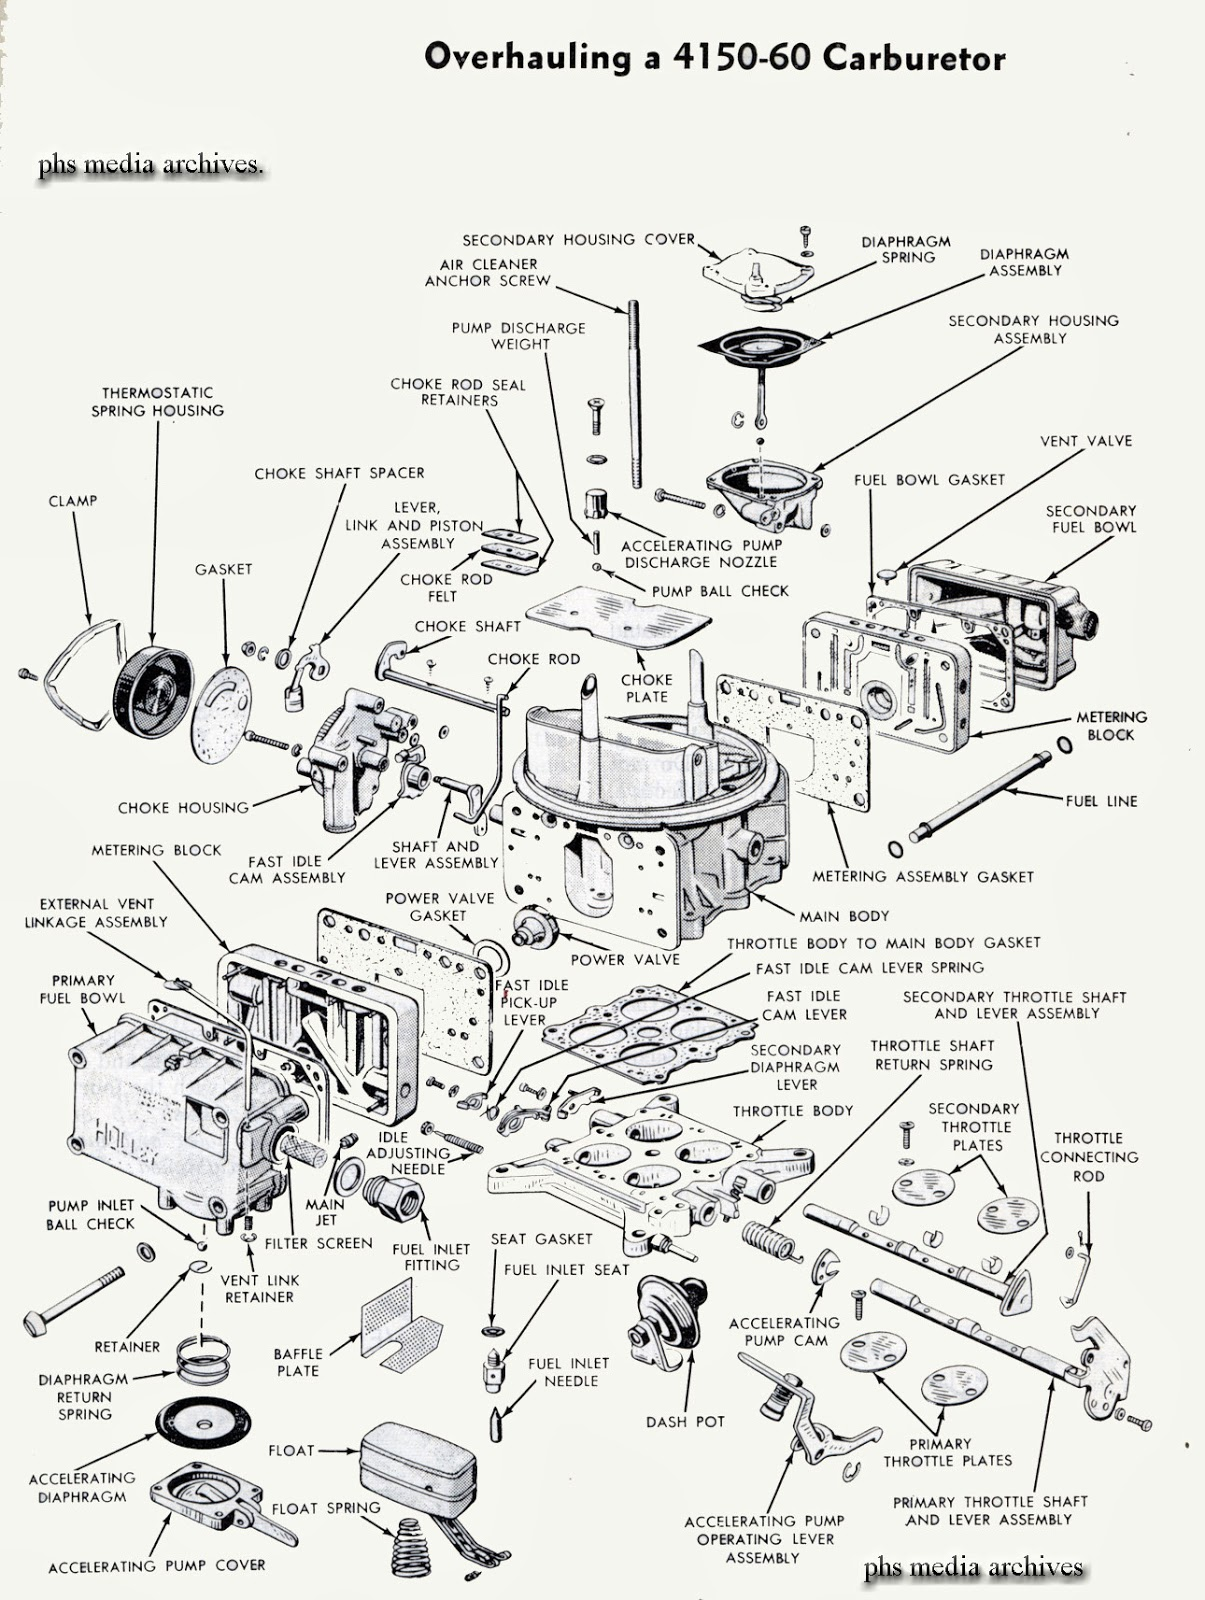 hight resolution of vacuum hose diagram moreover holley 2 barrel carburetor diagram terrain also holley carb vacuum port diagram